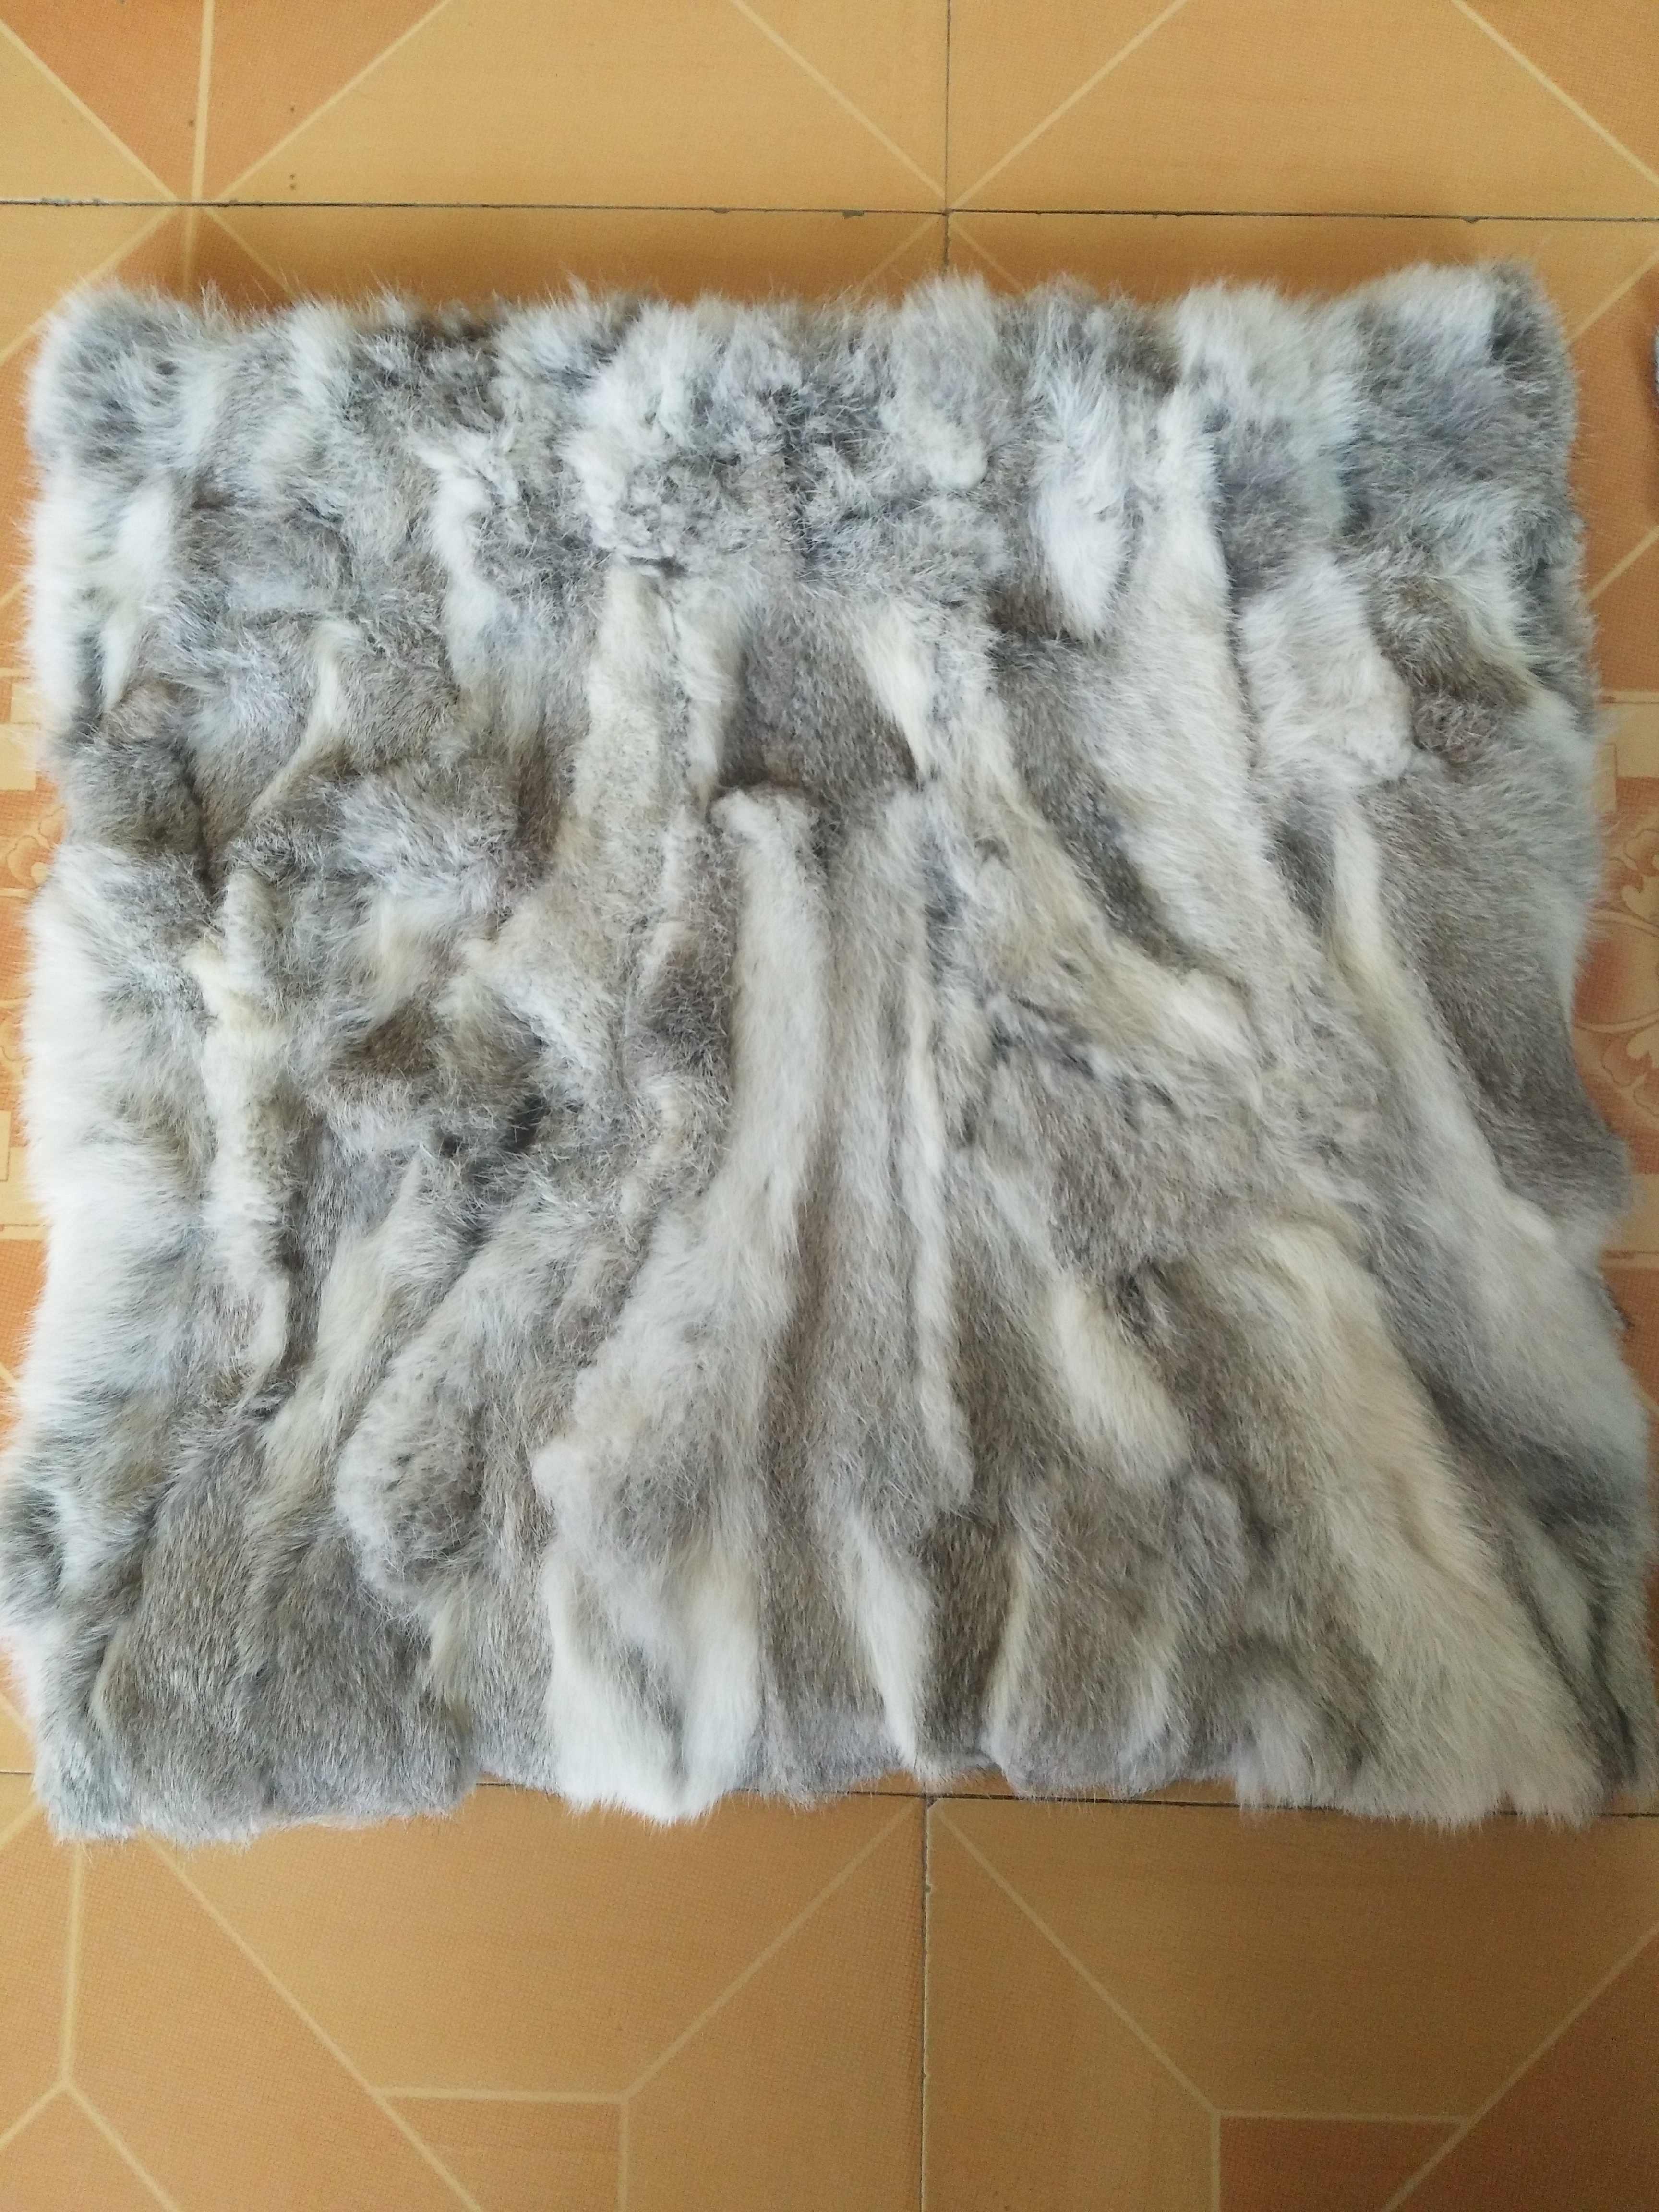 real rabbit fur cushion cover genuine natural rabbit fur pillow cover decorative pillows cushions home decor almofada new cushion cover aliexpress